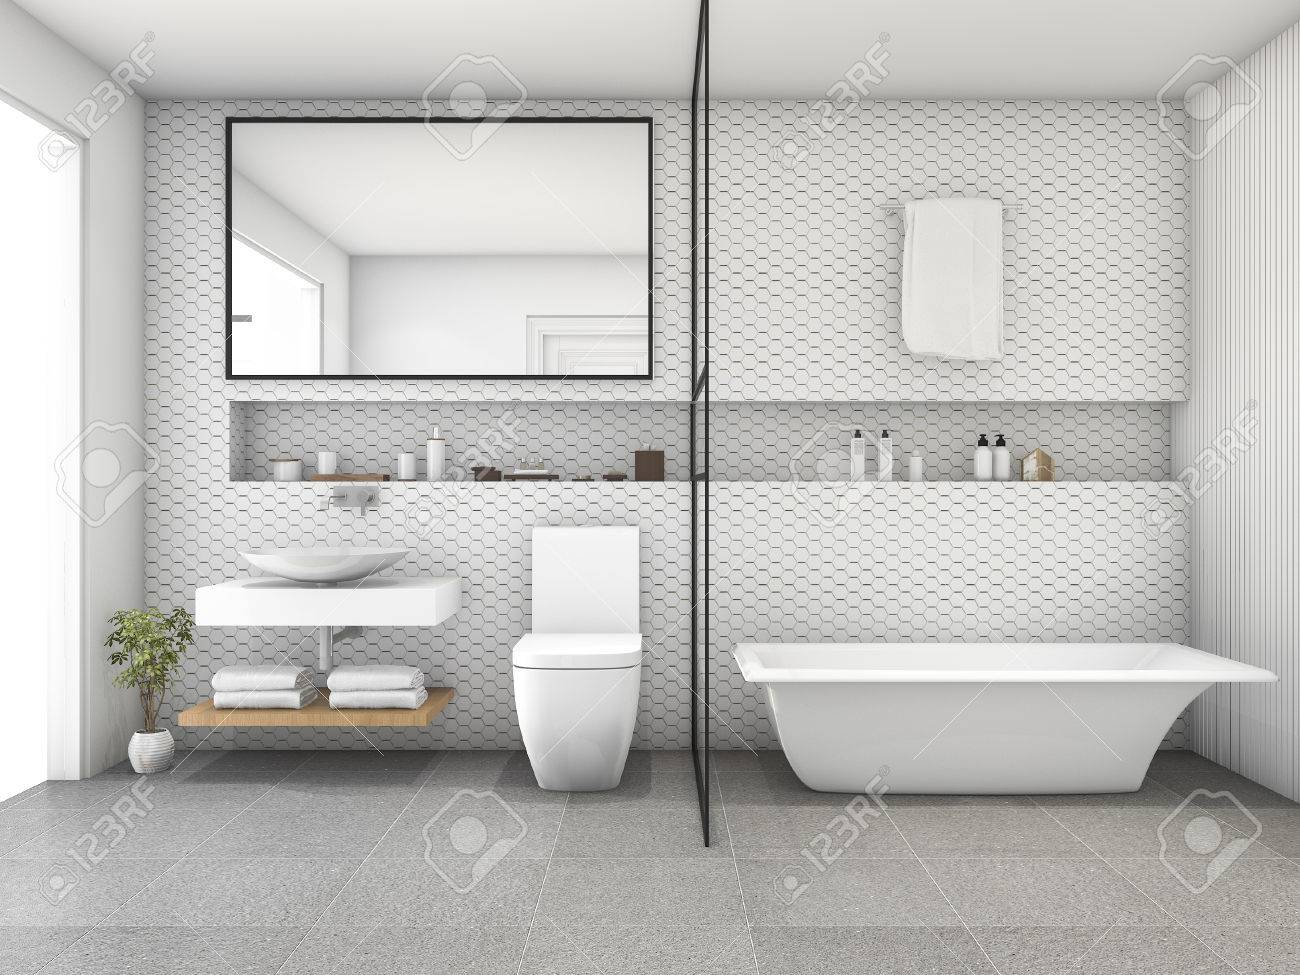 Representación 3d hexágono azulejo blanco moderno cuarto de baño